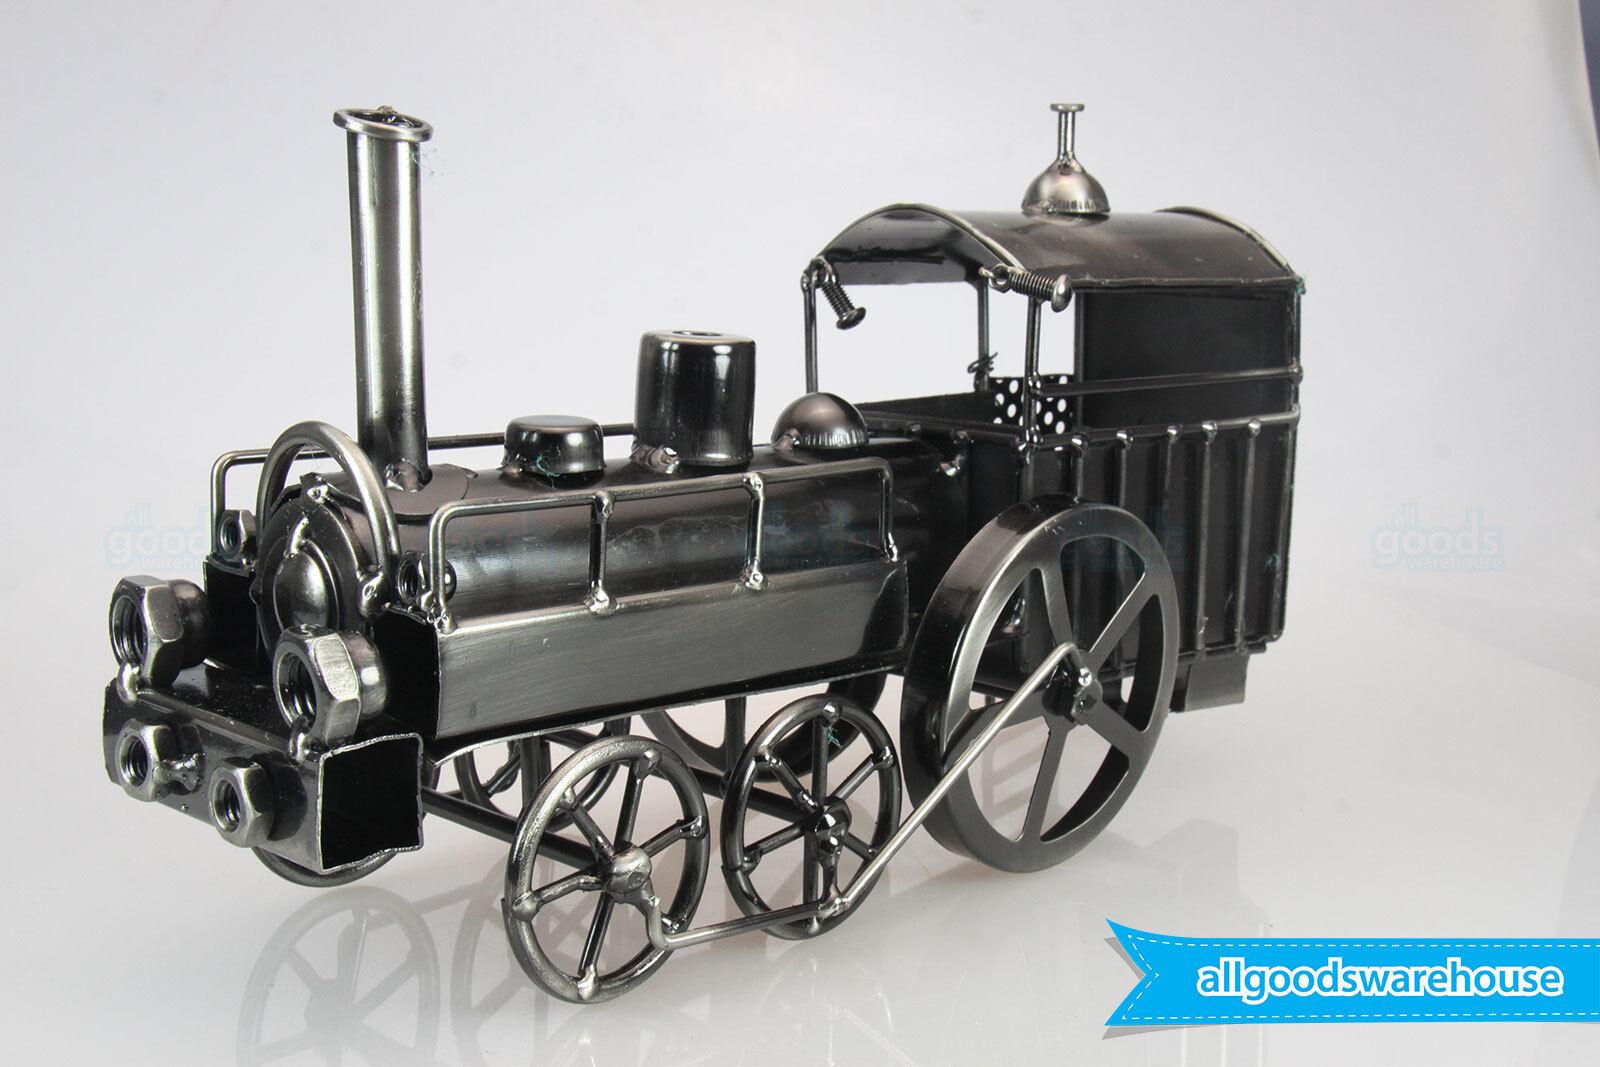 Scrap Metal Art Handmade Nuts & Bolts Vintage Steam Train Gift Model Collector